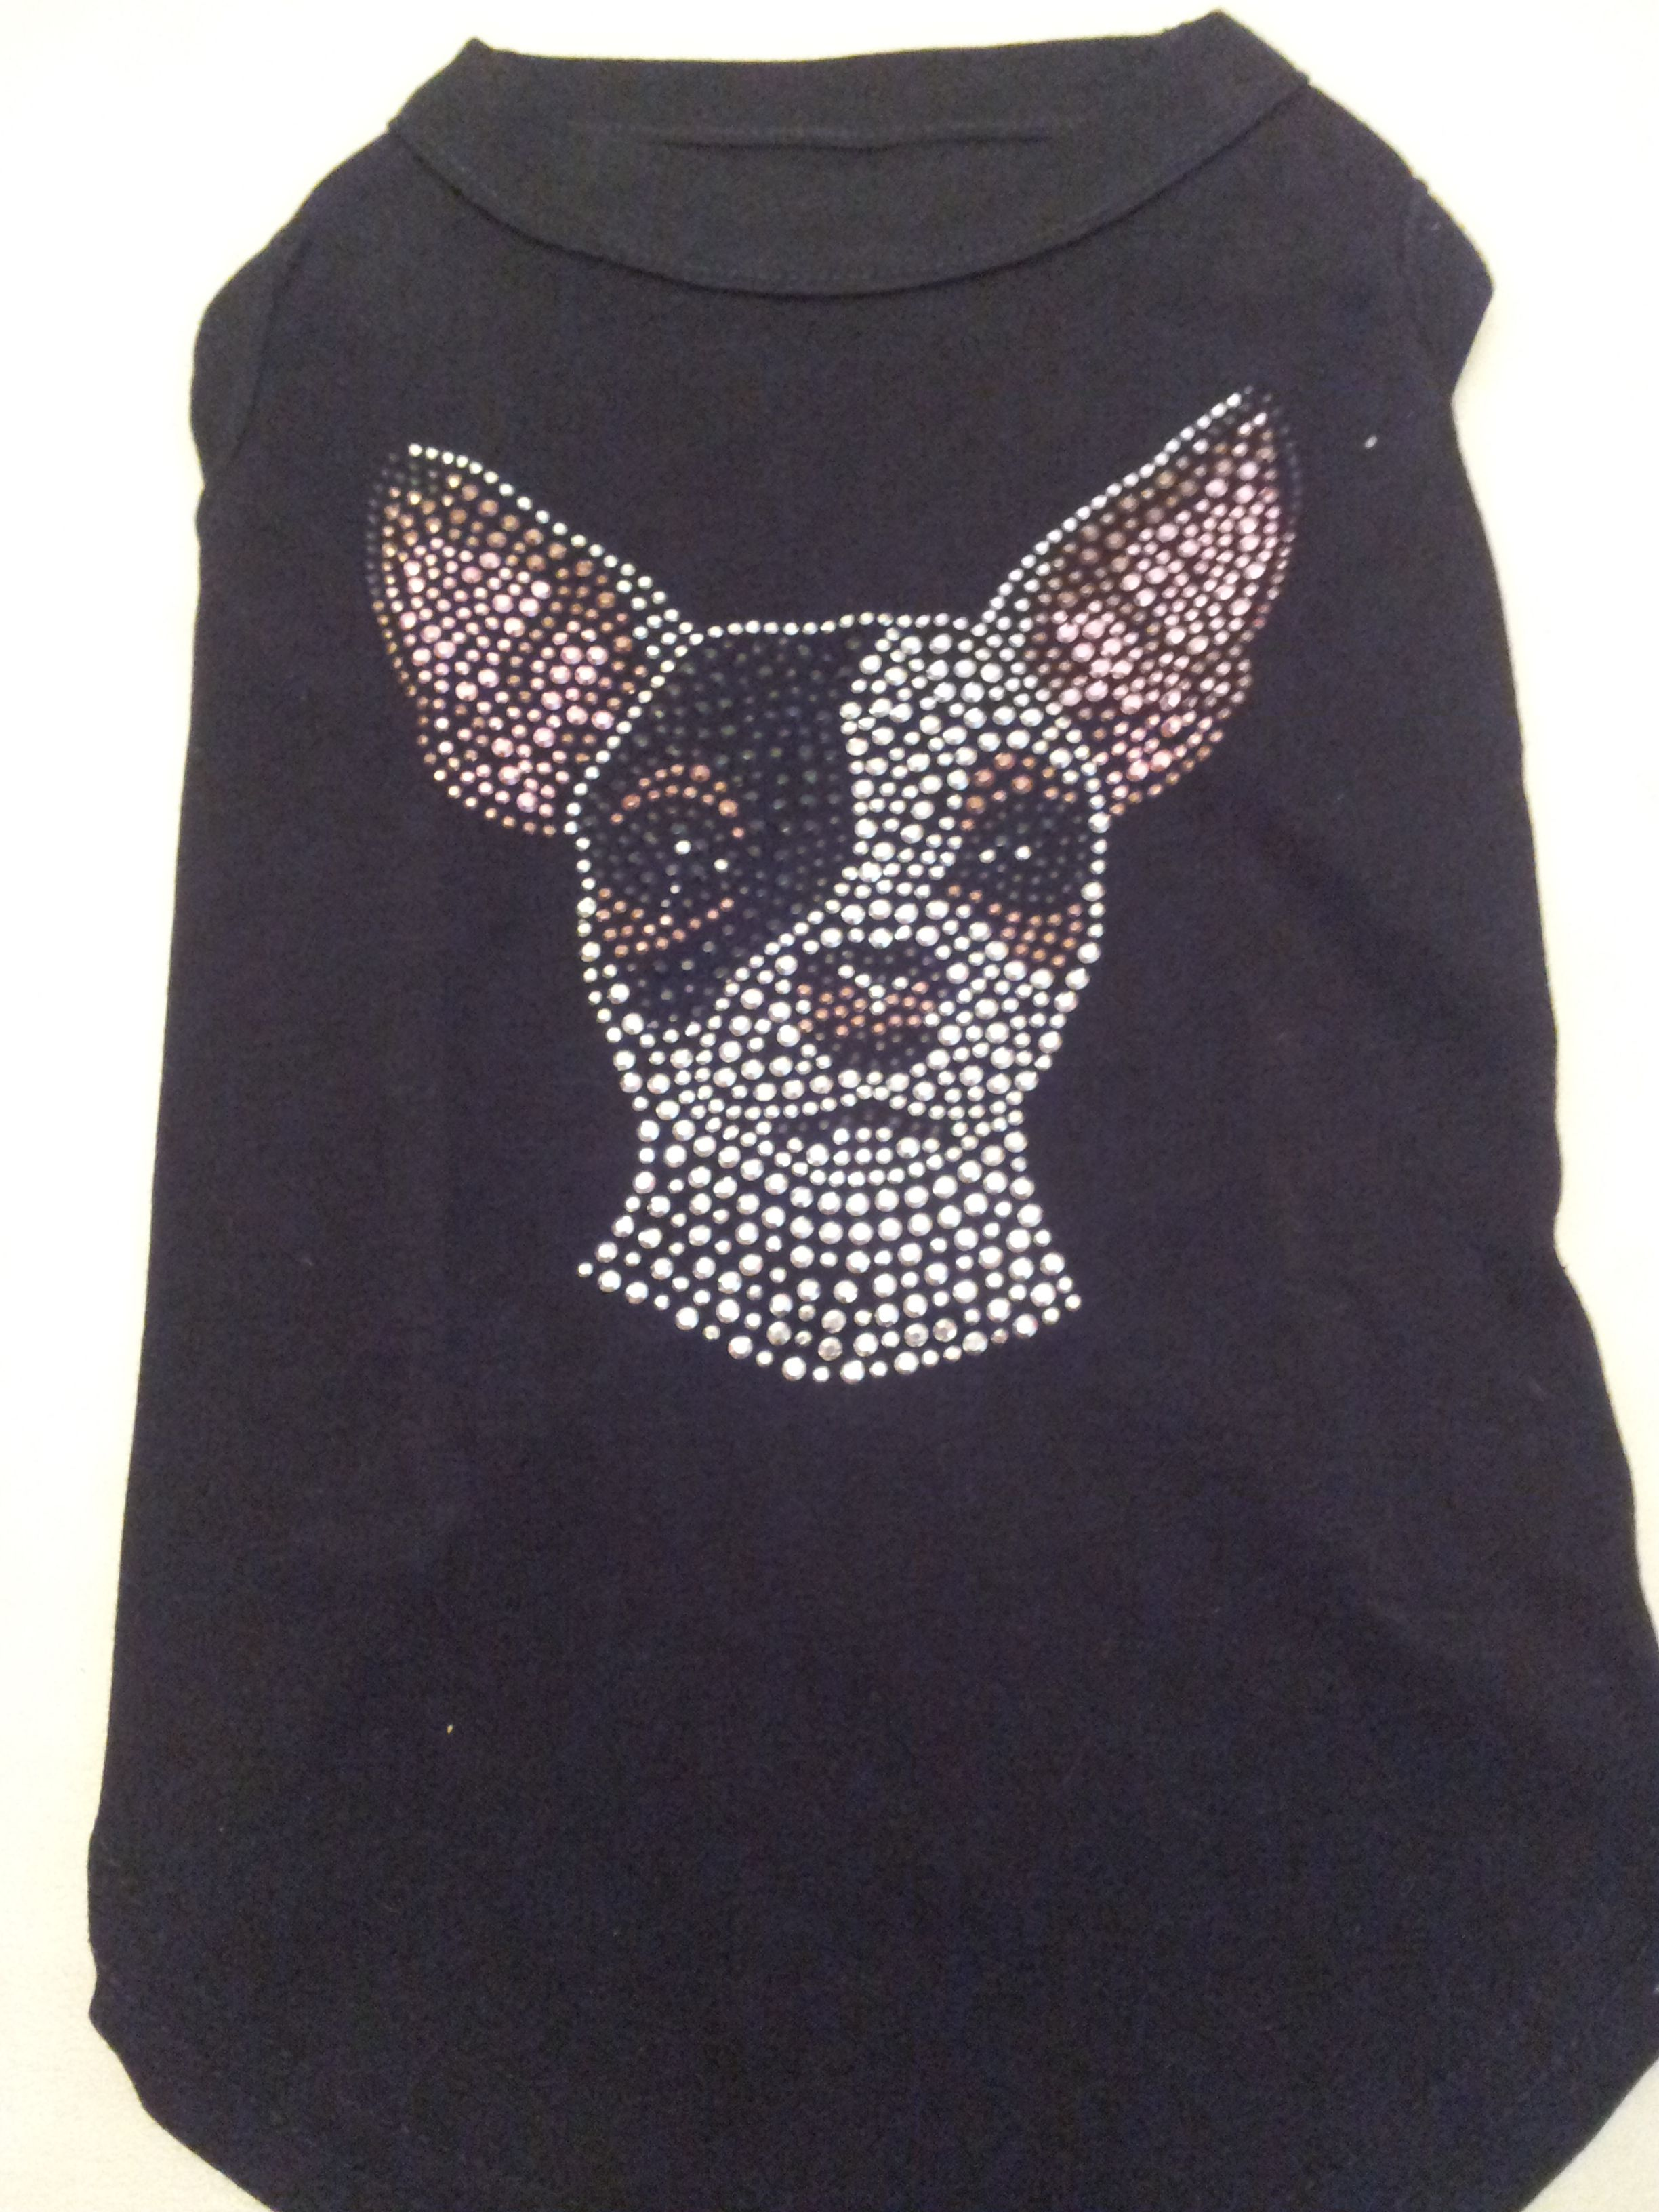 Tshirt Met Strass Chihuahua 19 95 Diversen Maten En Kleuren